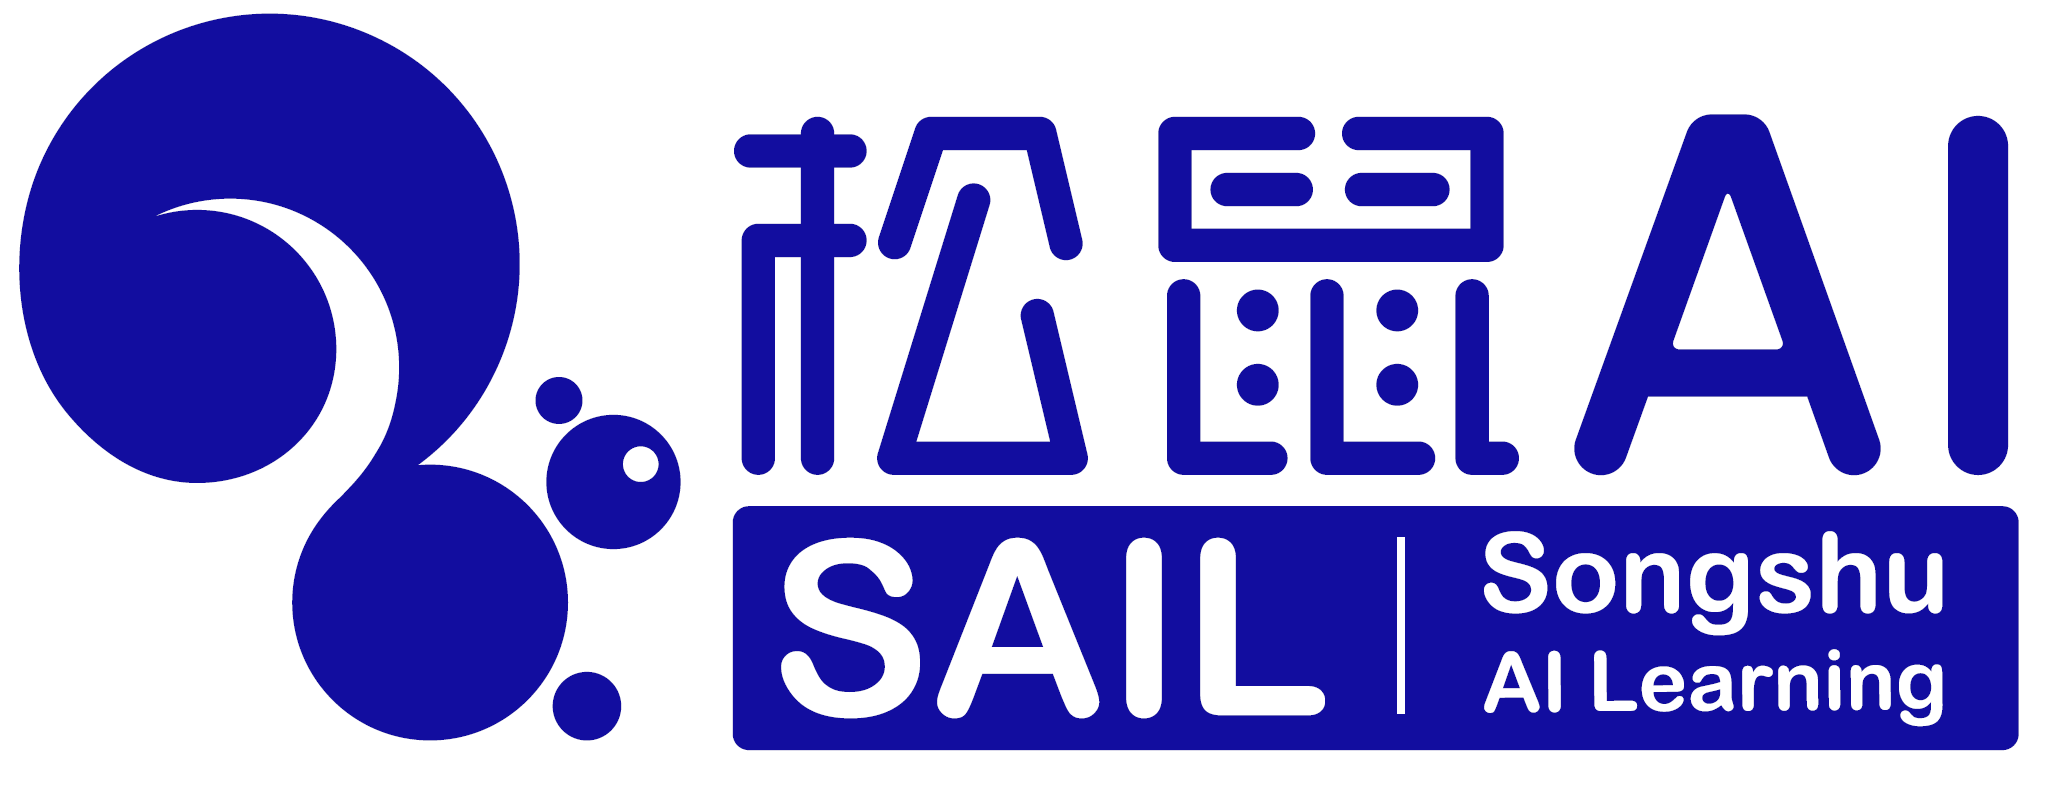 IJCAI-ECAI-18 – July 13-19 2018, Stockholm, Sweden